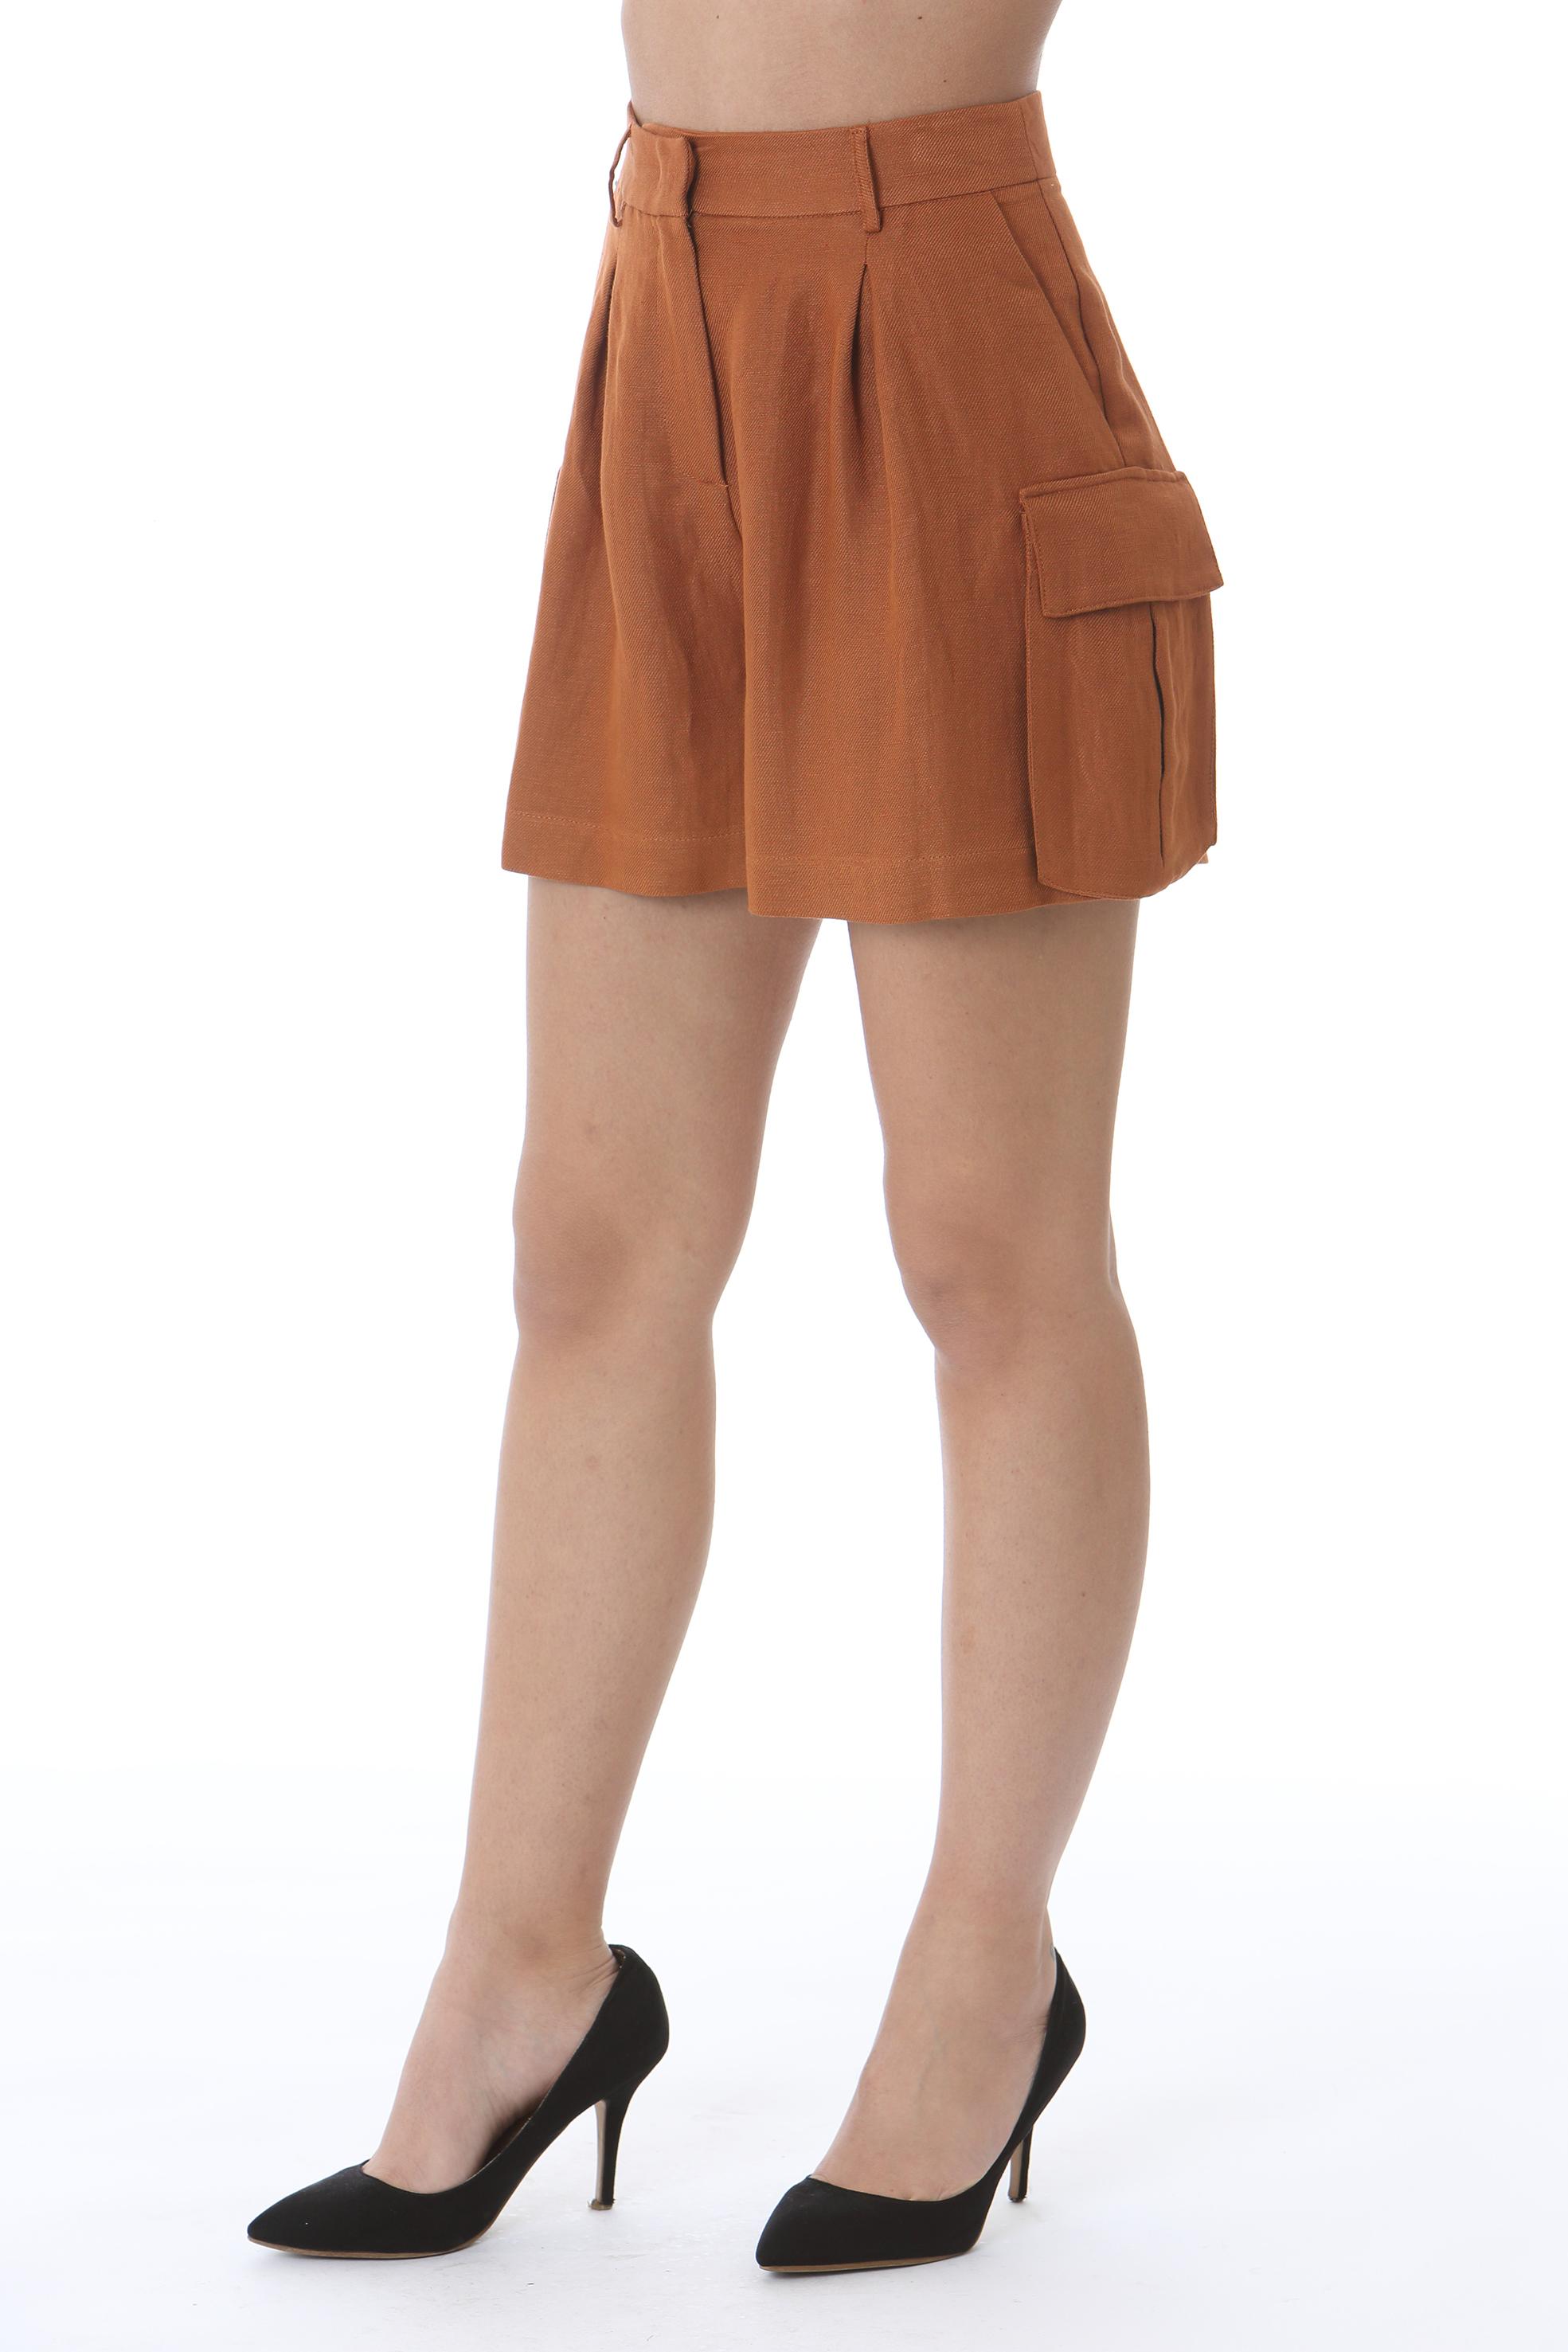 SHORTS CON TASHE MANILA GRACE | Shorts | P362RUMA045